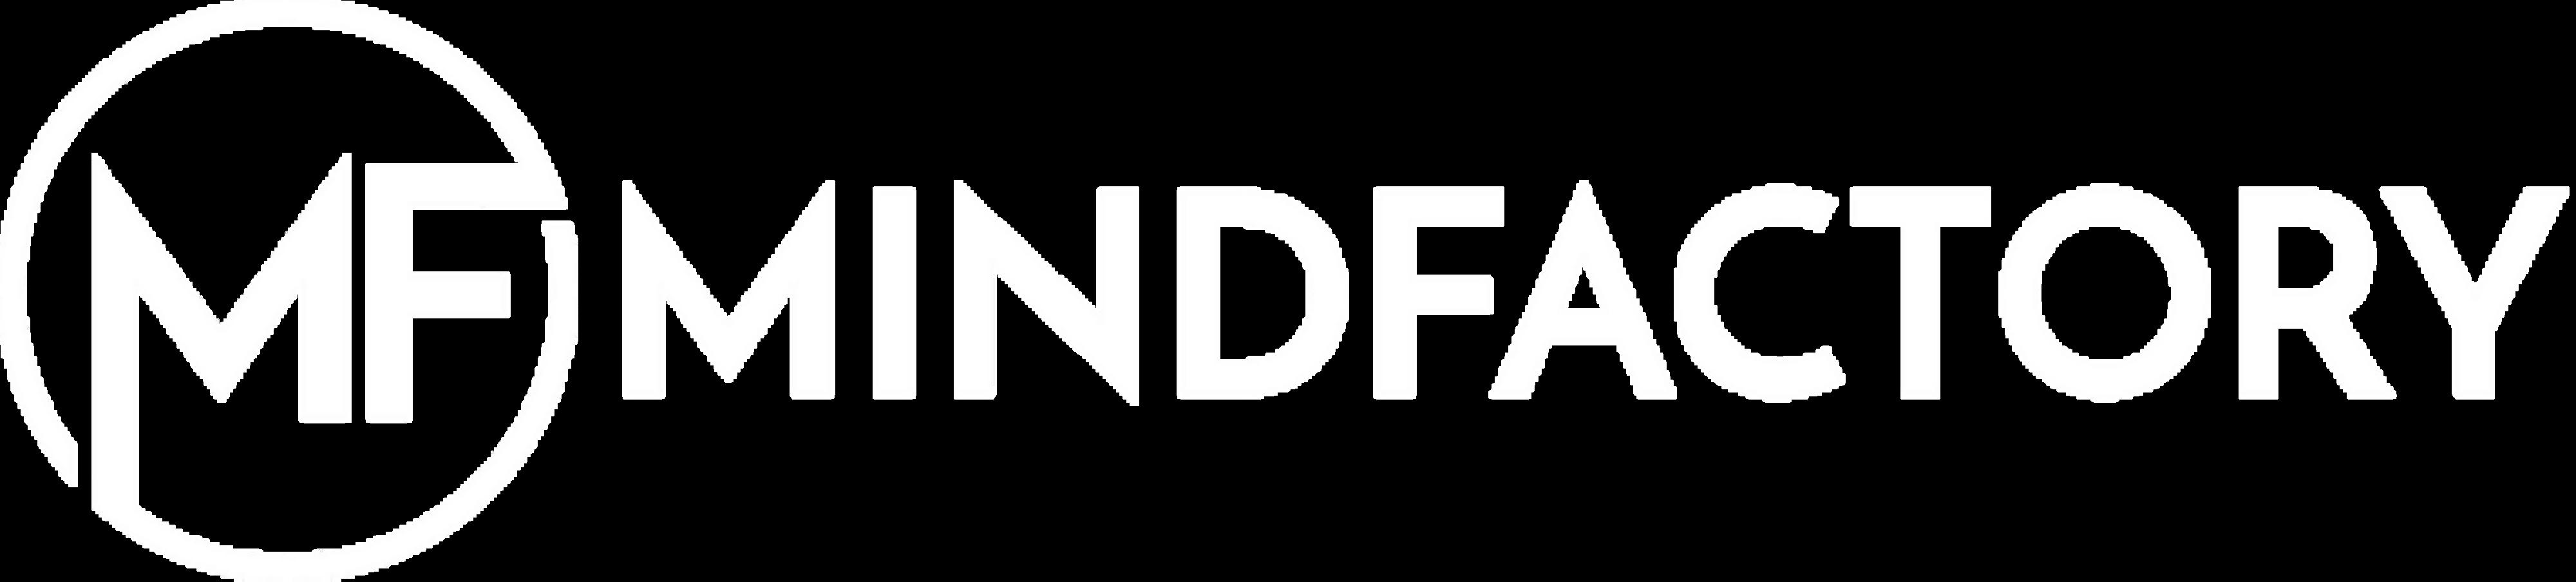 MF MindFactory